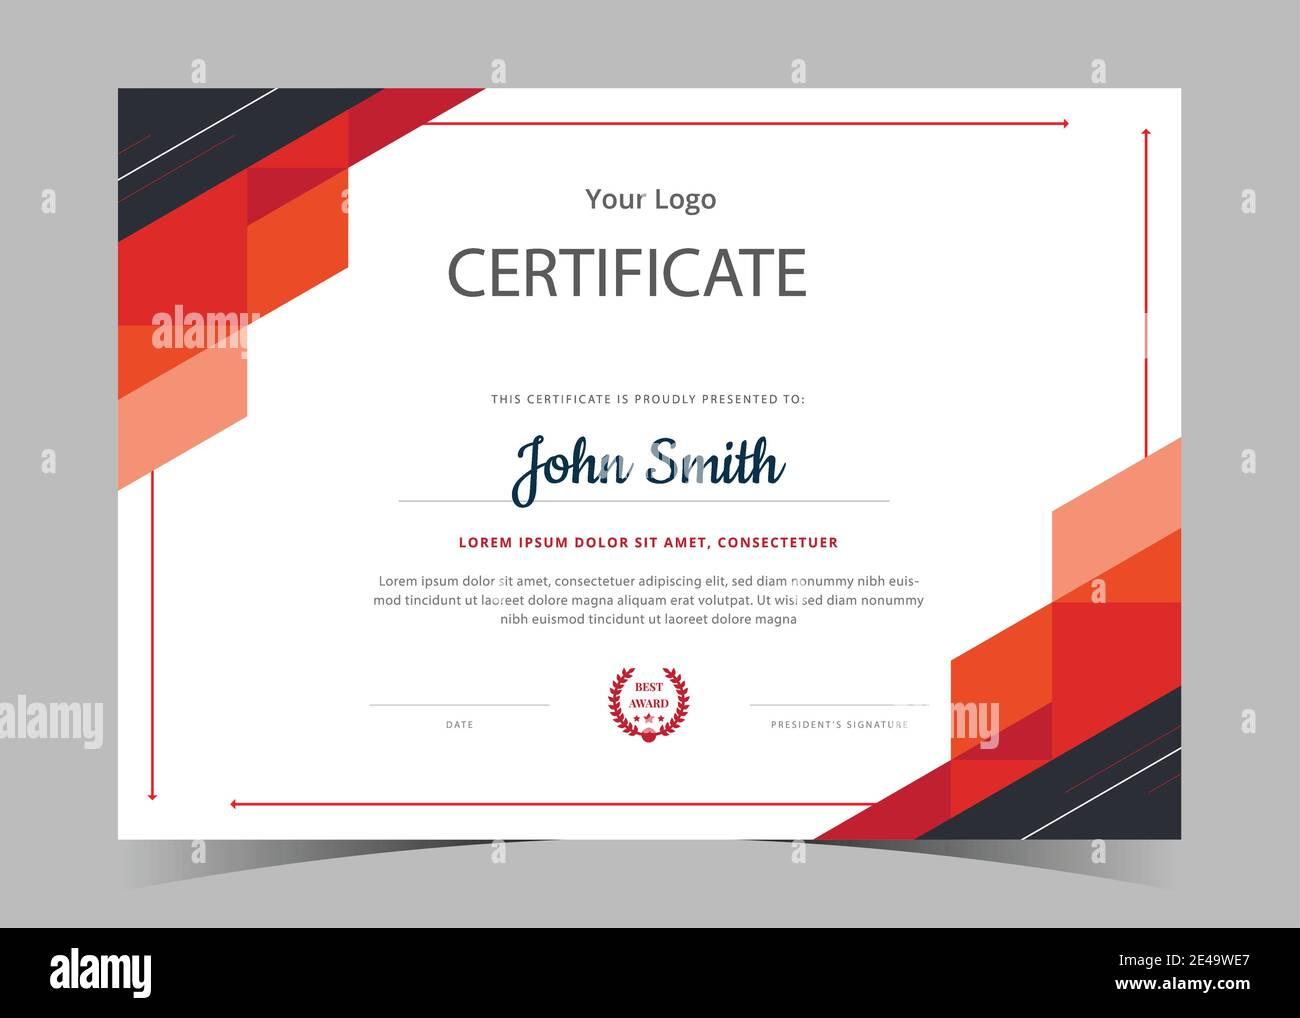 certificate template awards diploma. Professional Certificate Inside Award Certificate Design Template